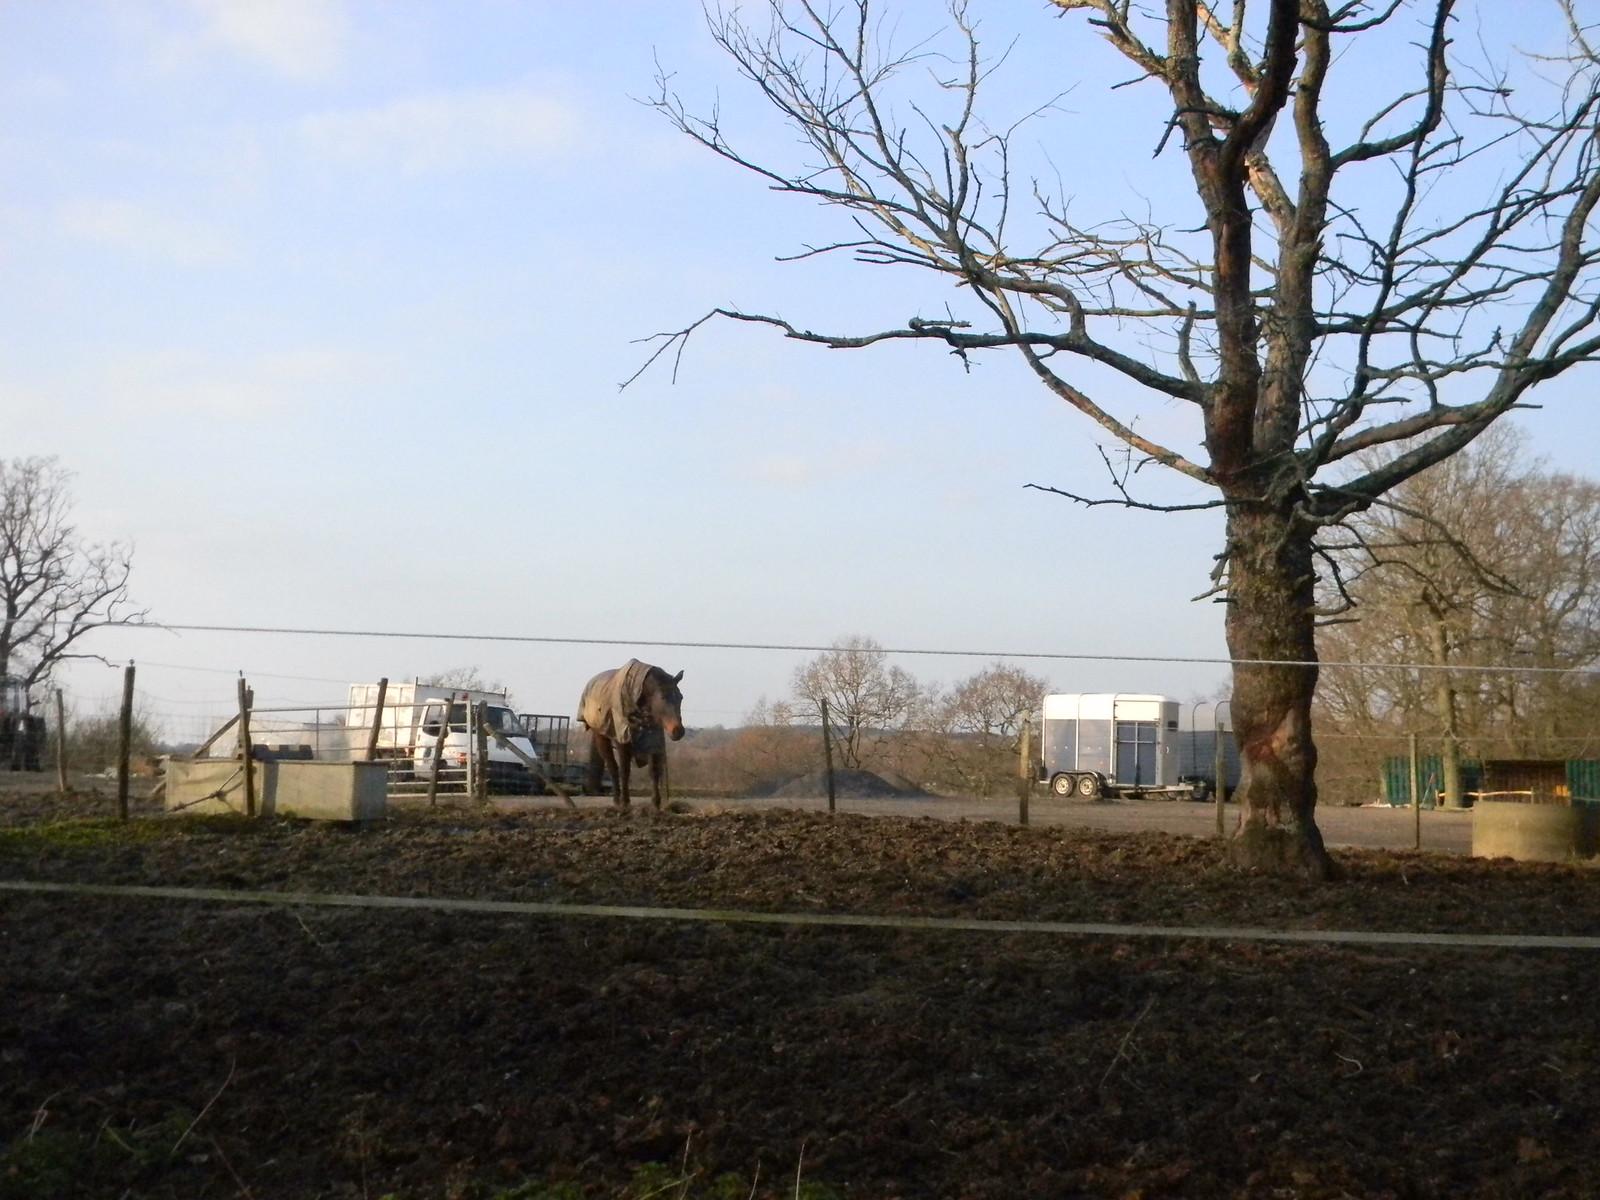 Horse Robertsbridge to Battle